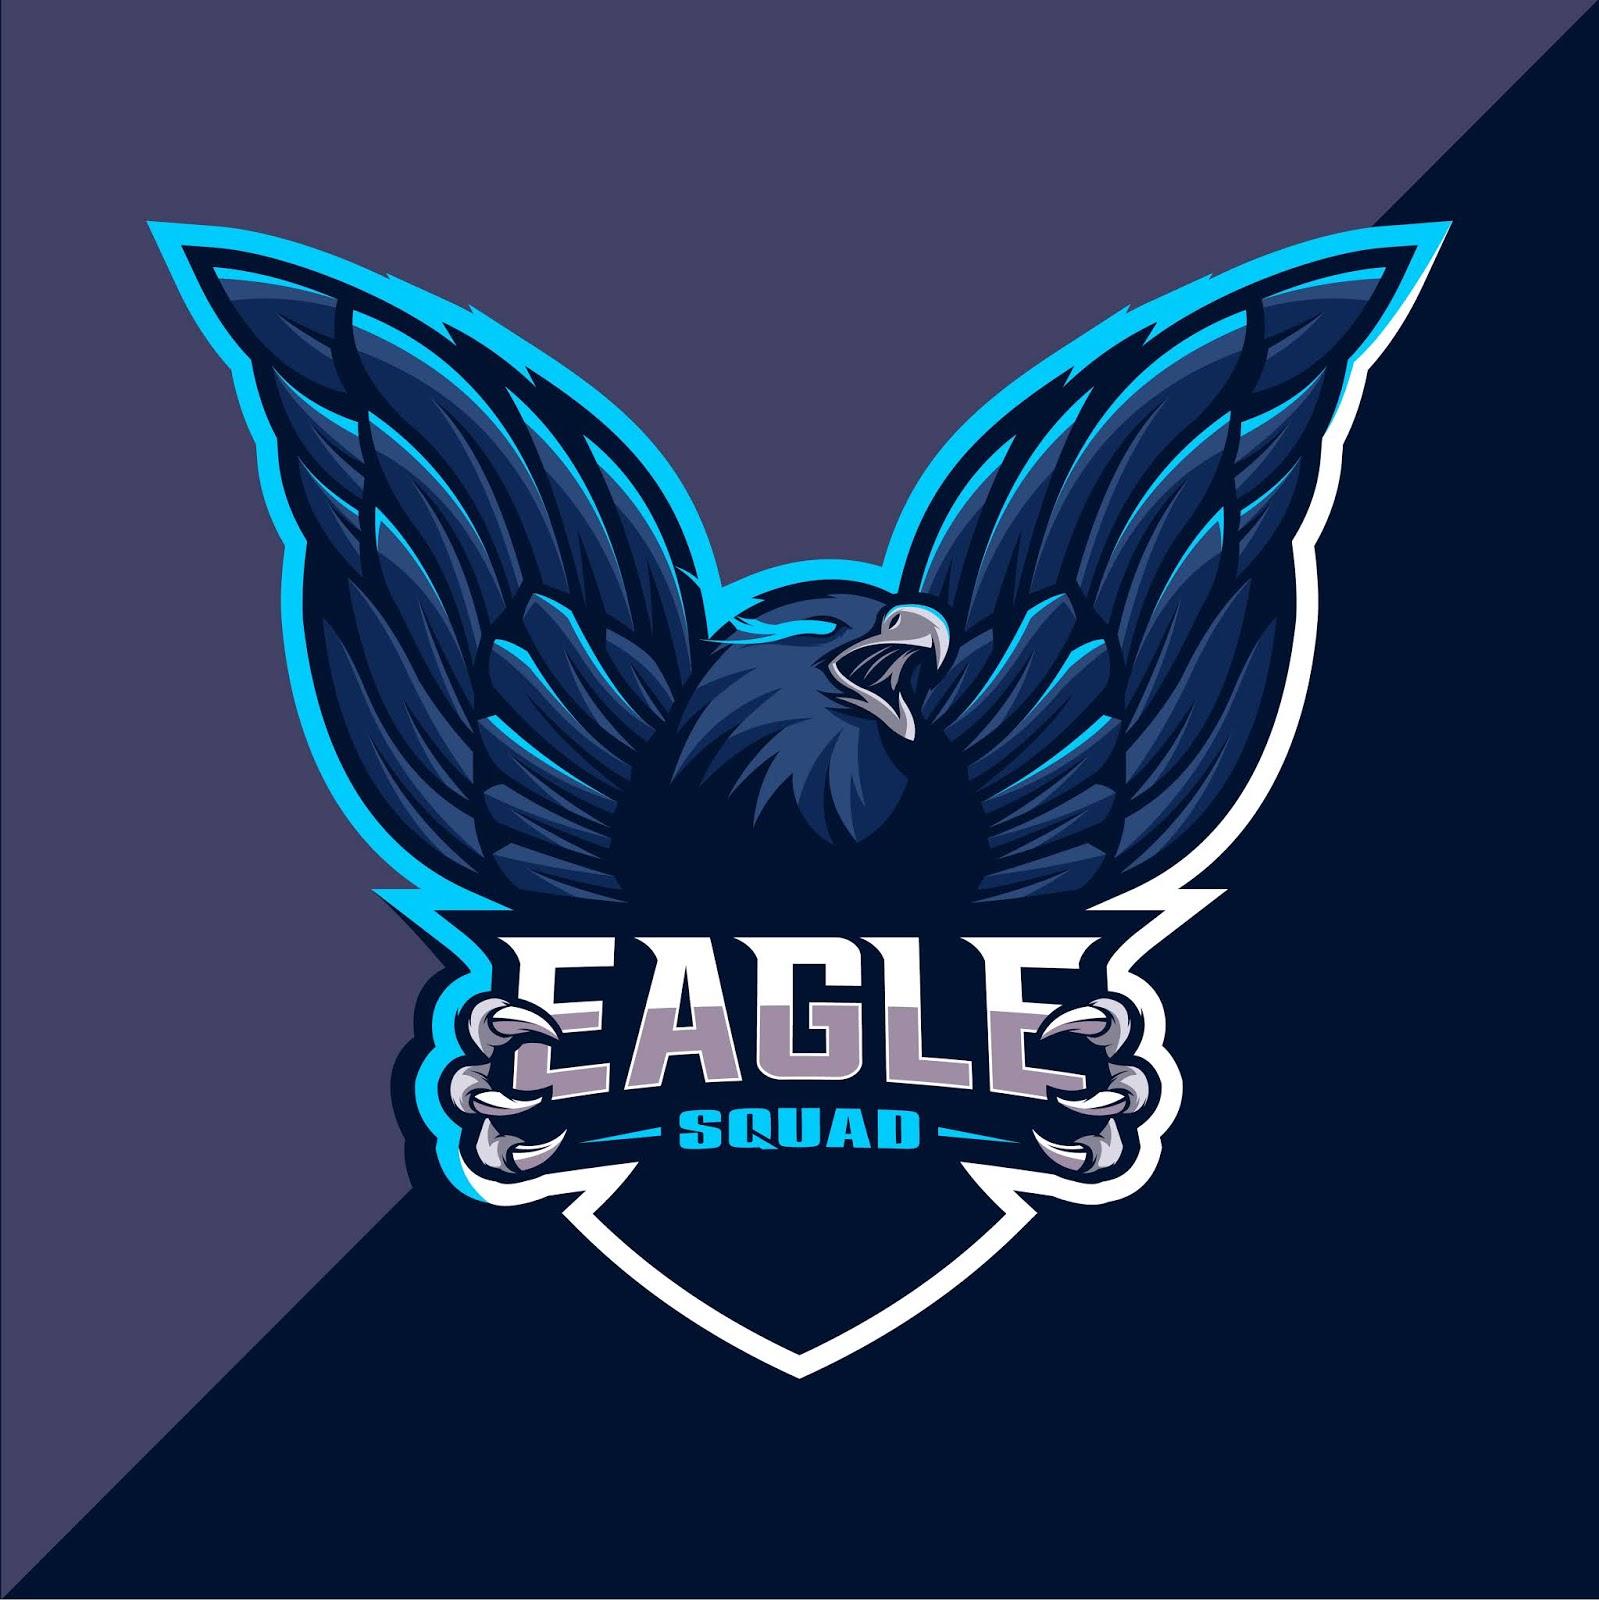 Eagle Mascot Esport Logo Design Free Download Vector CDR, AI, EPS and PNG Formats